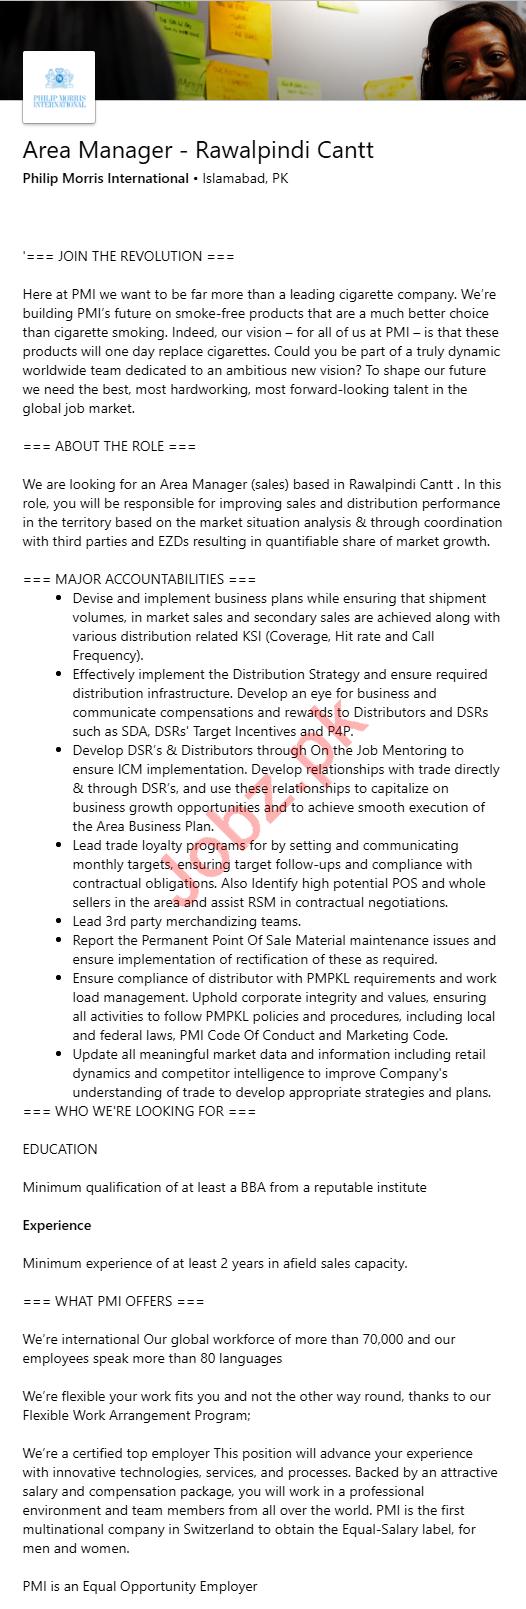 Philip Morris International Rawalpindi Cantt Jobs 2020